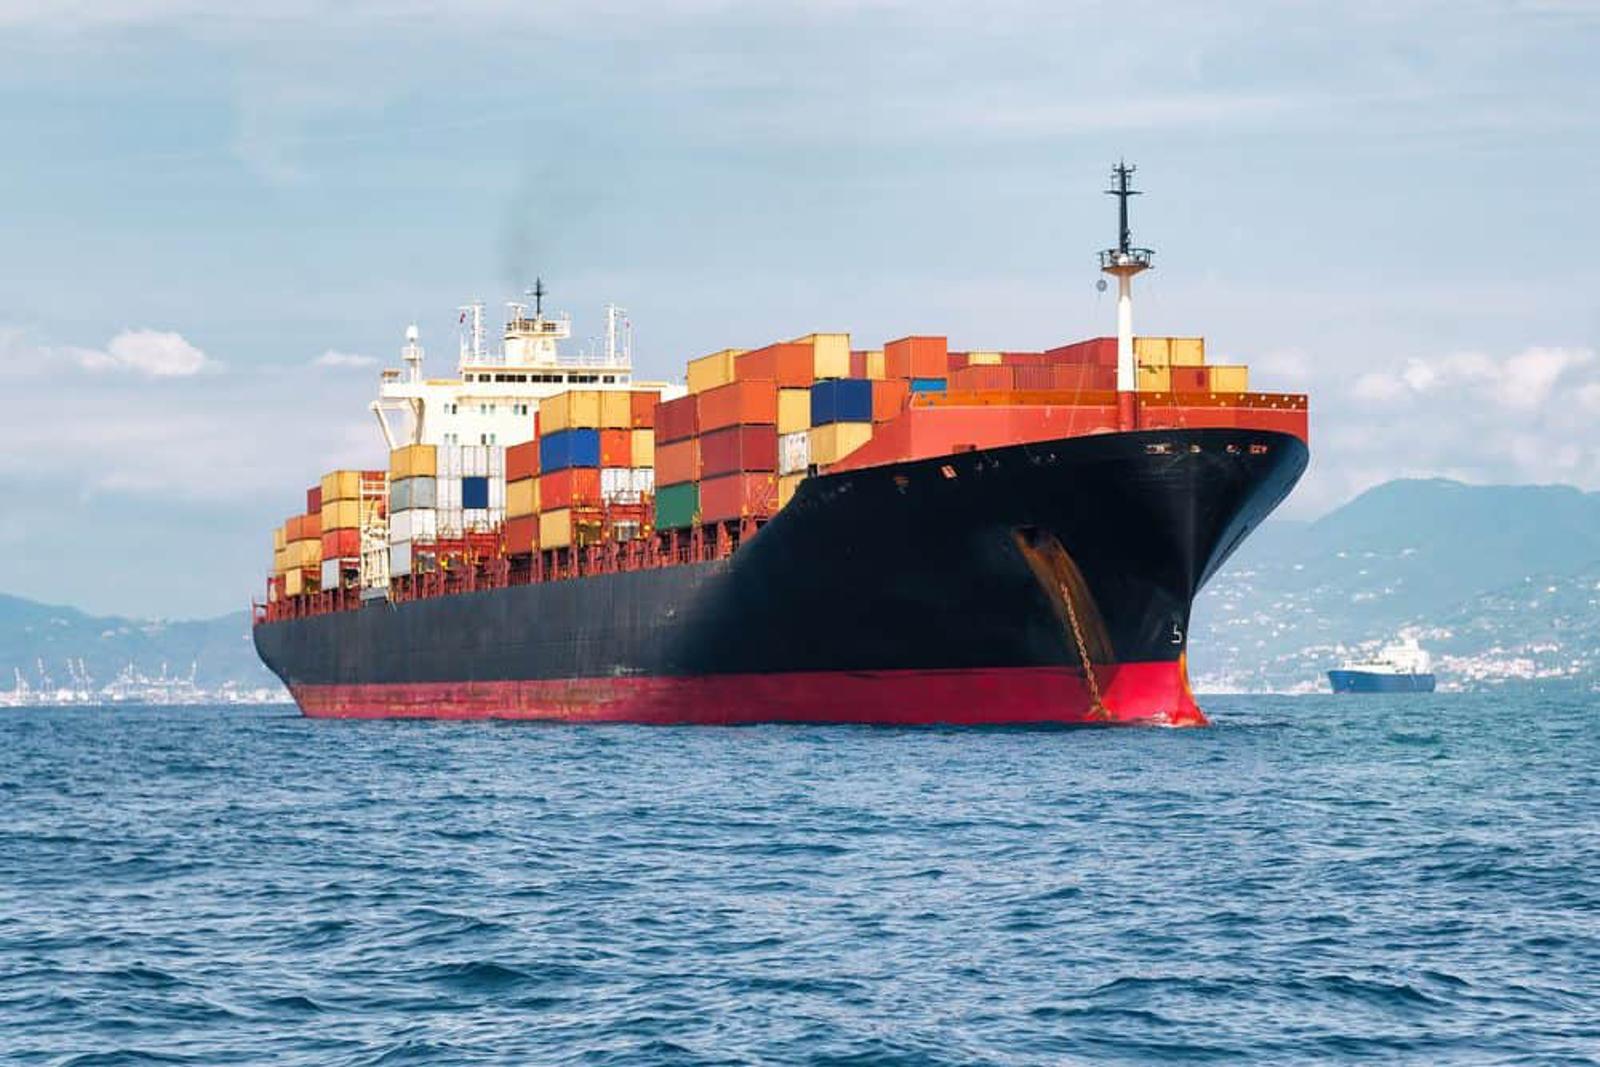 Negotiations Over Seafarers' Minimum Wage Increase Break Down